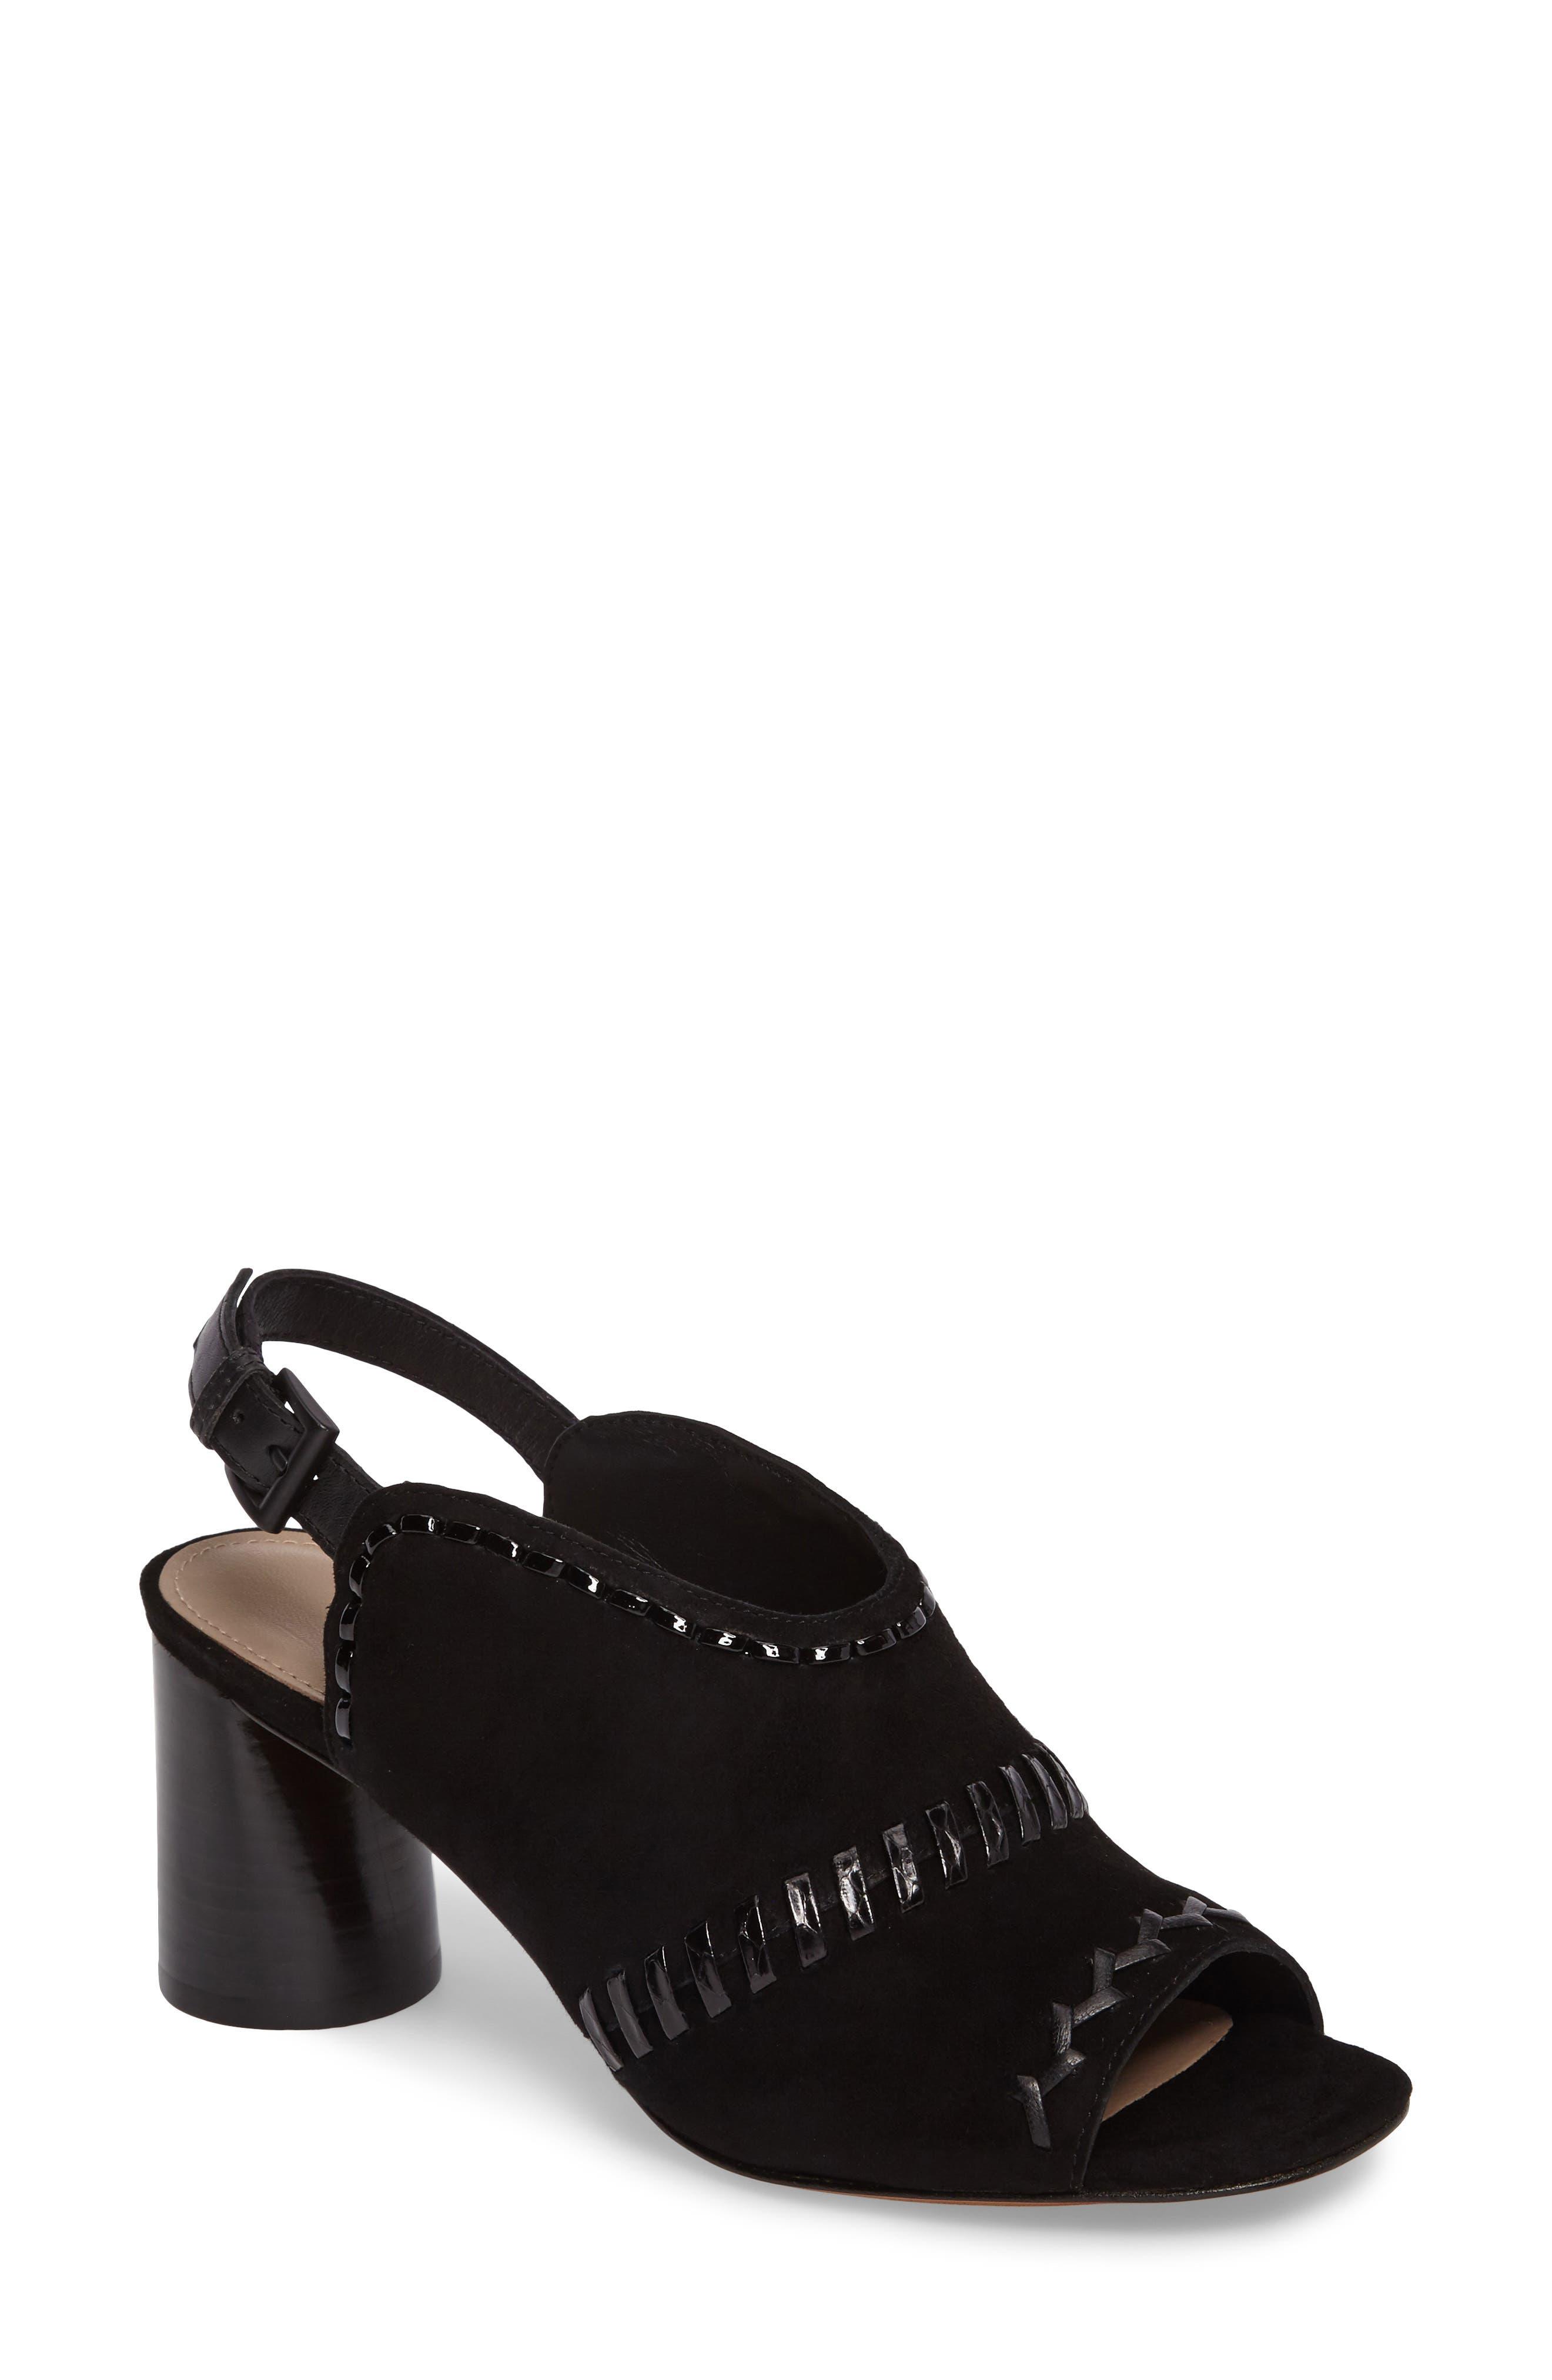 Alternate Image 1 Selected - Donald Pliner Hemi Cone Heel Slingback Sandal (Women)